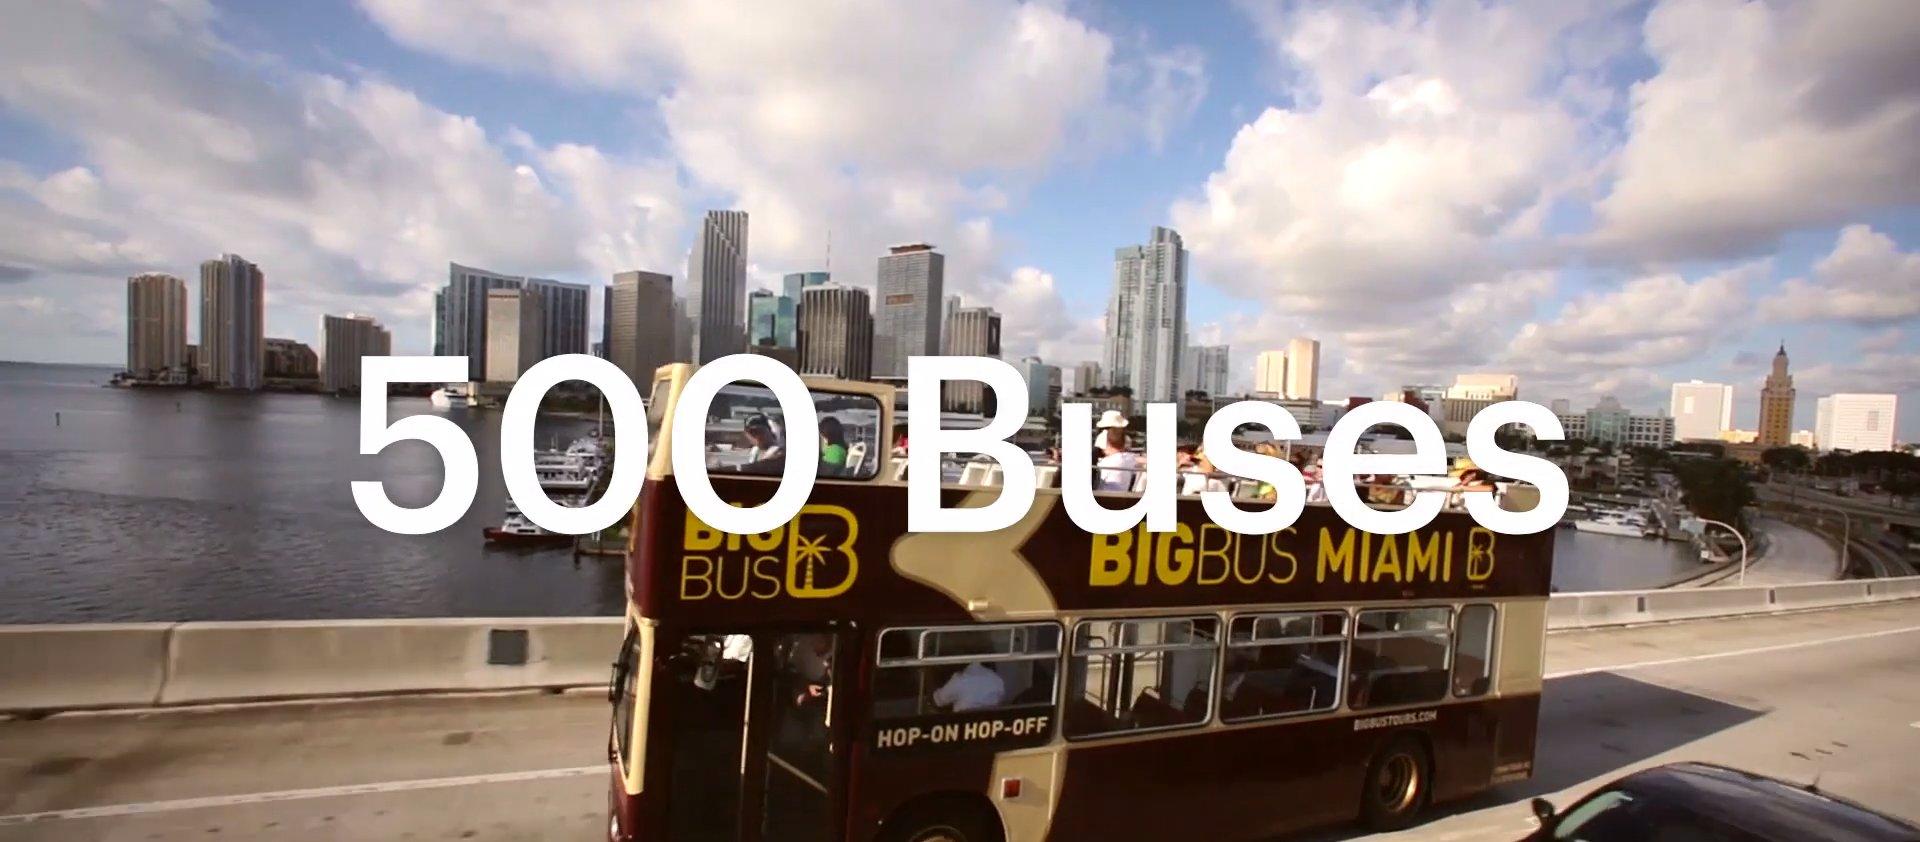 Magento webáruház Big Bus 500 busz